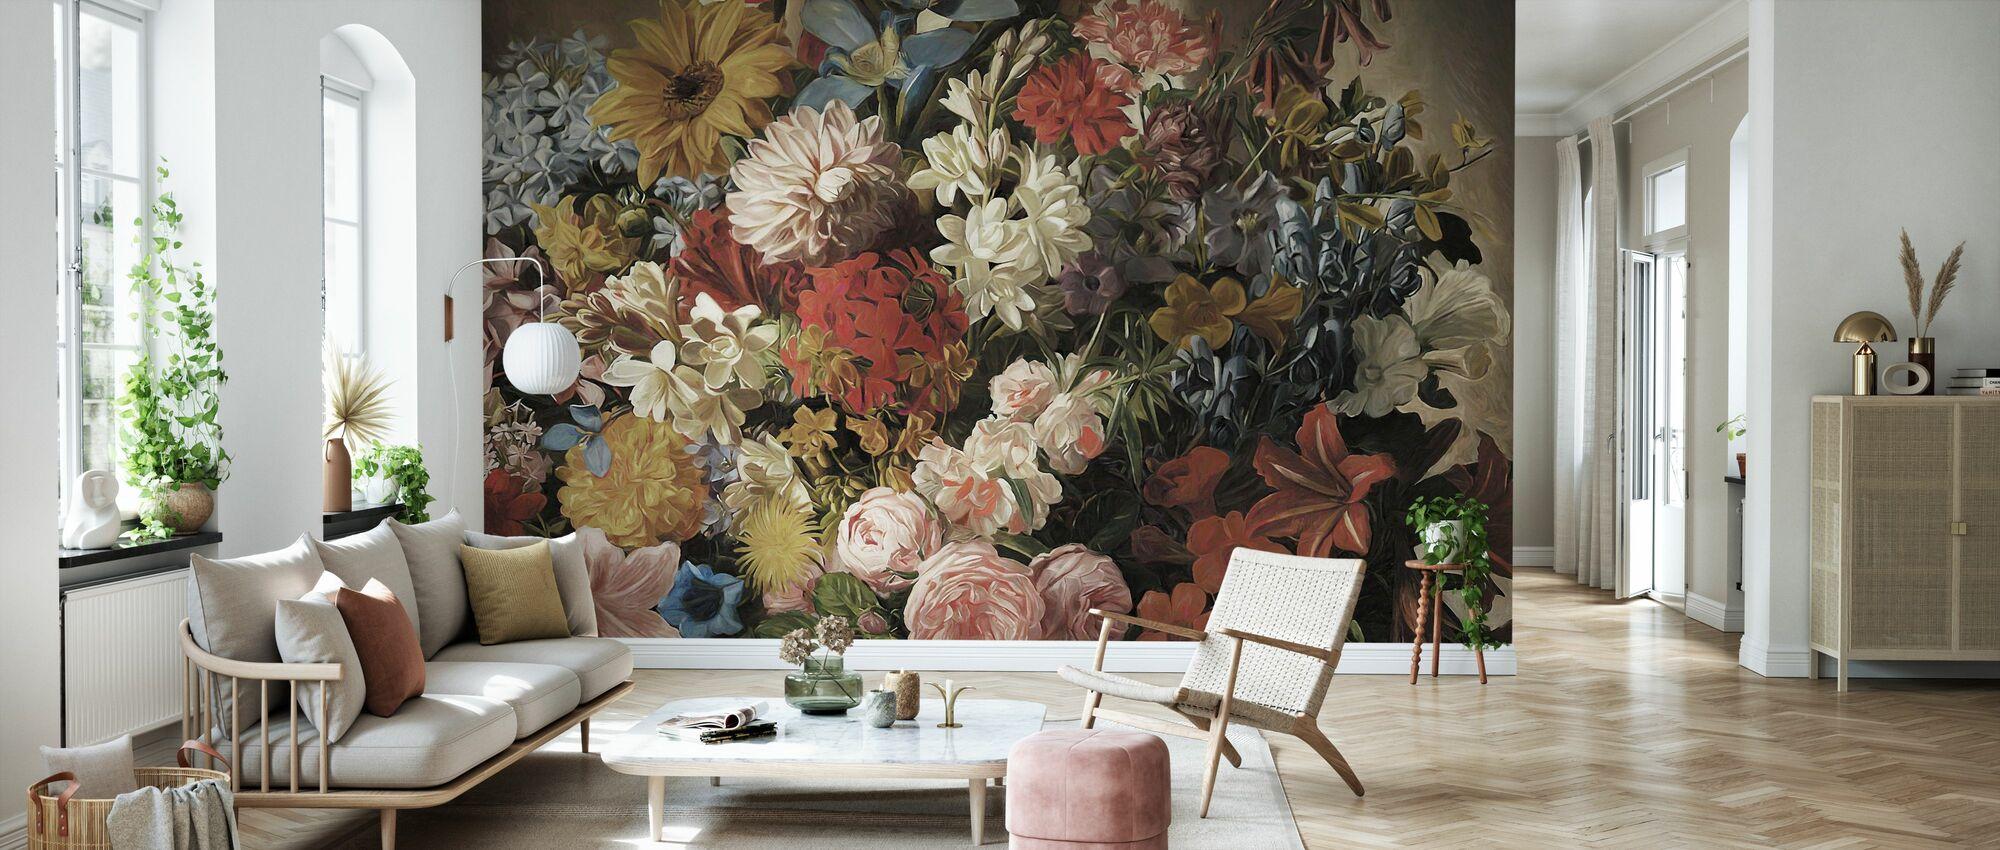 Le Grand Bouquet - Bright - Wallpaper - Living Room